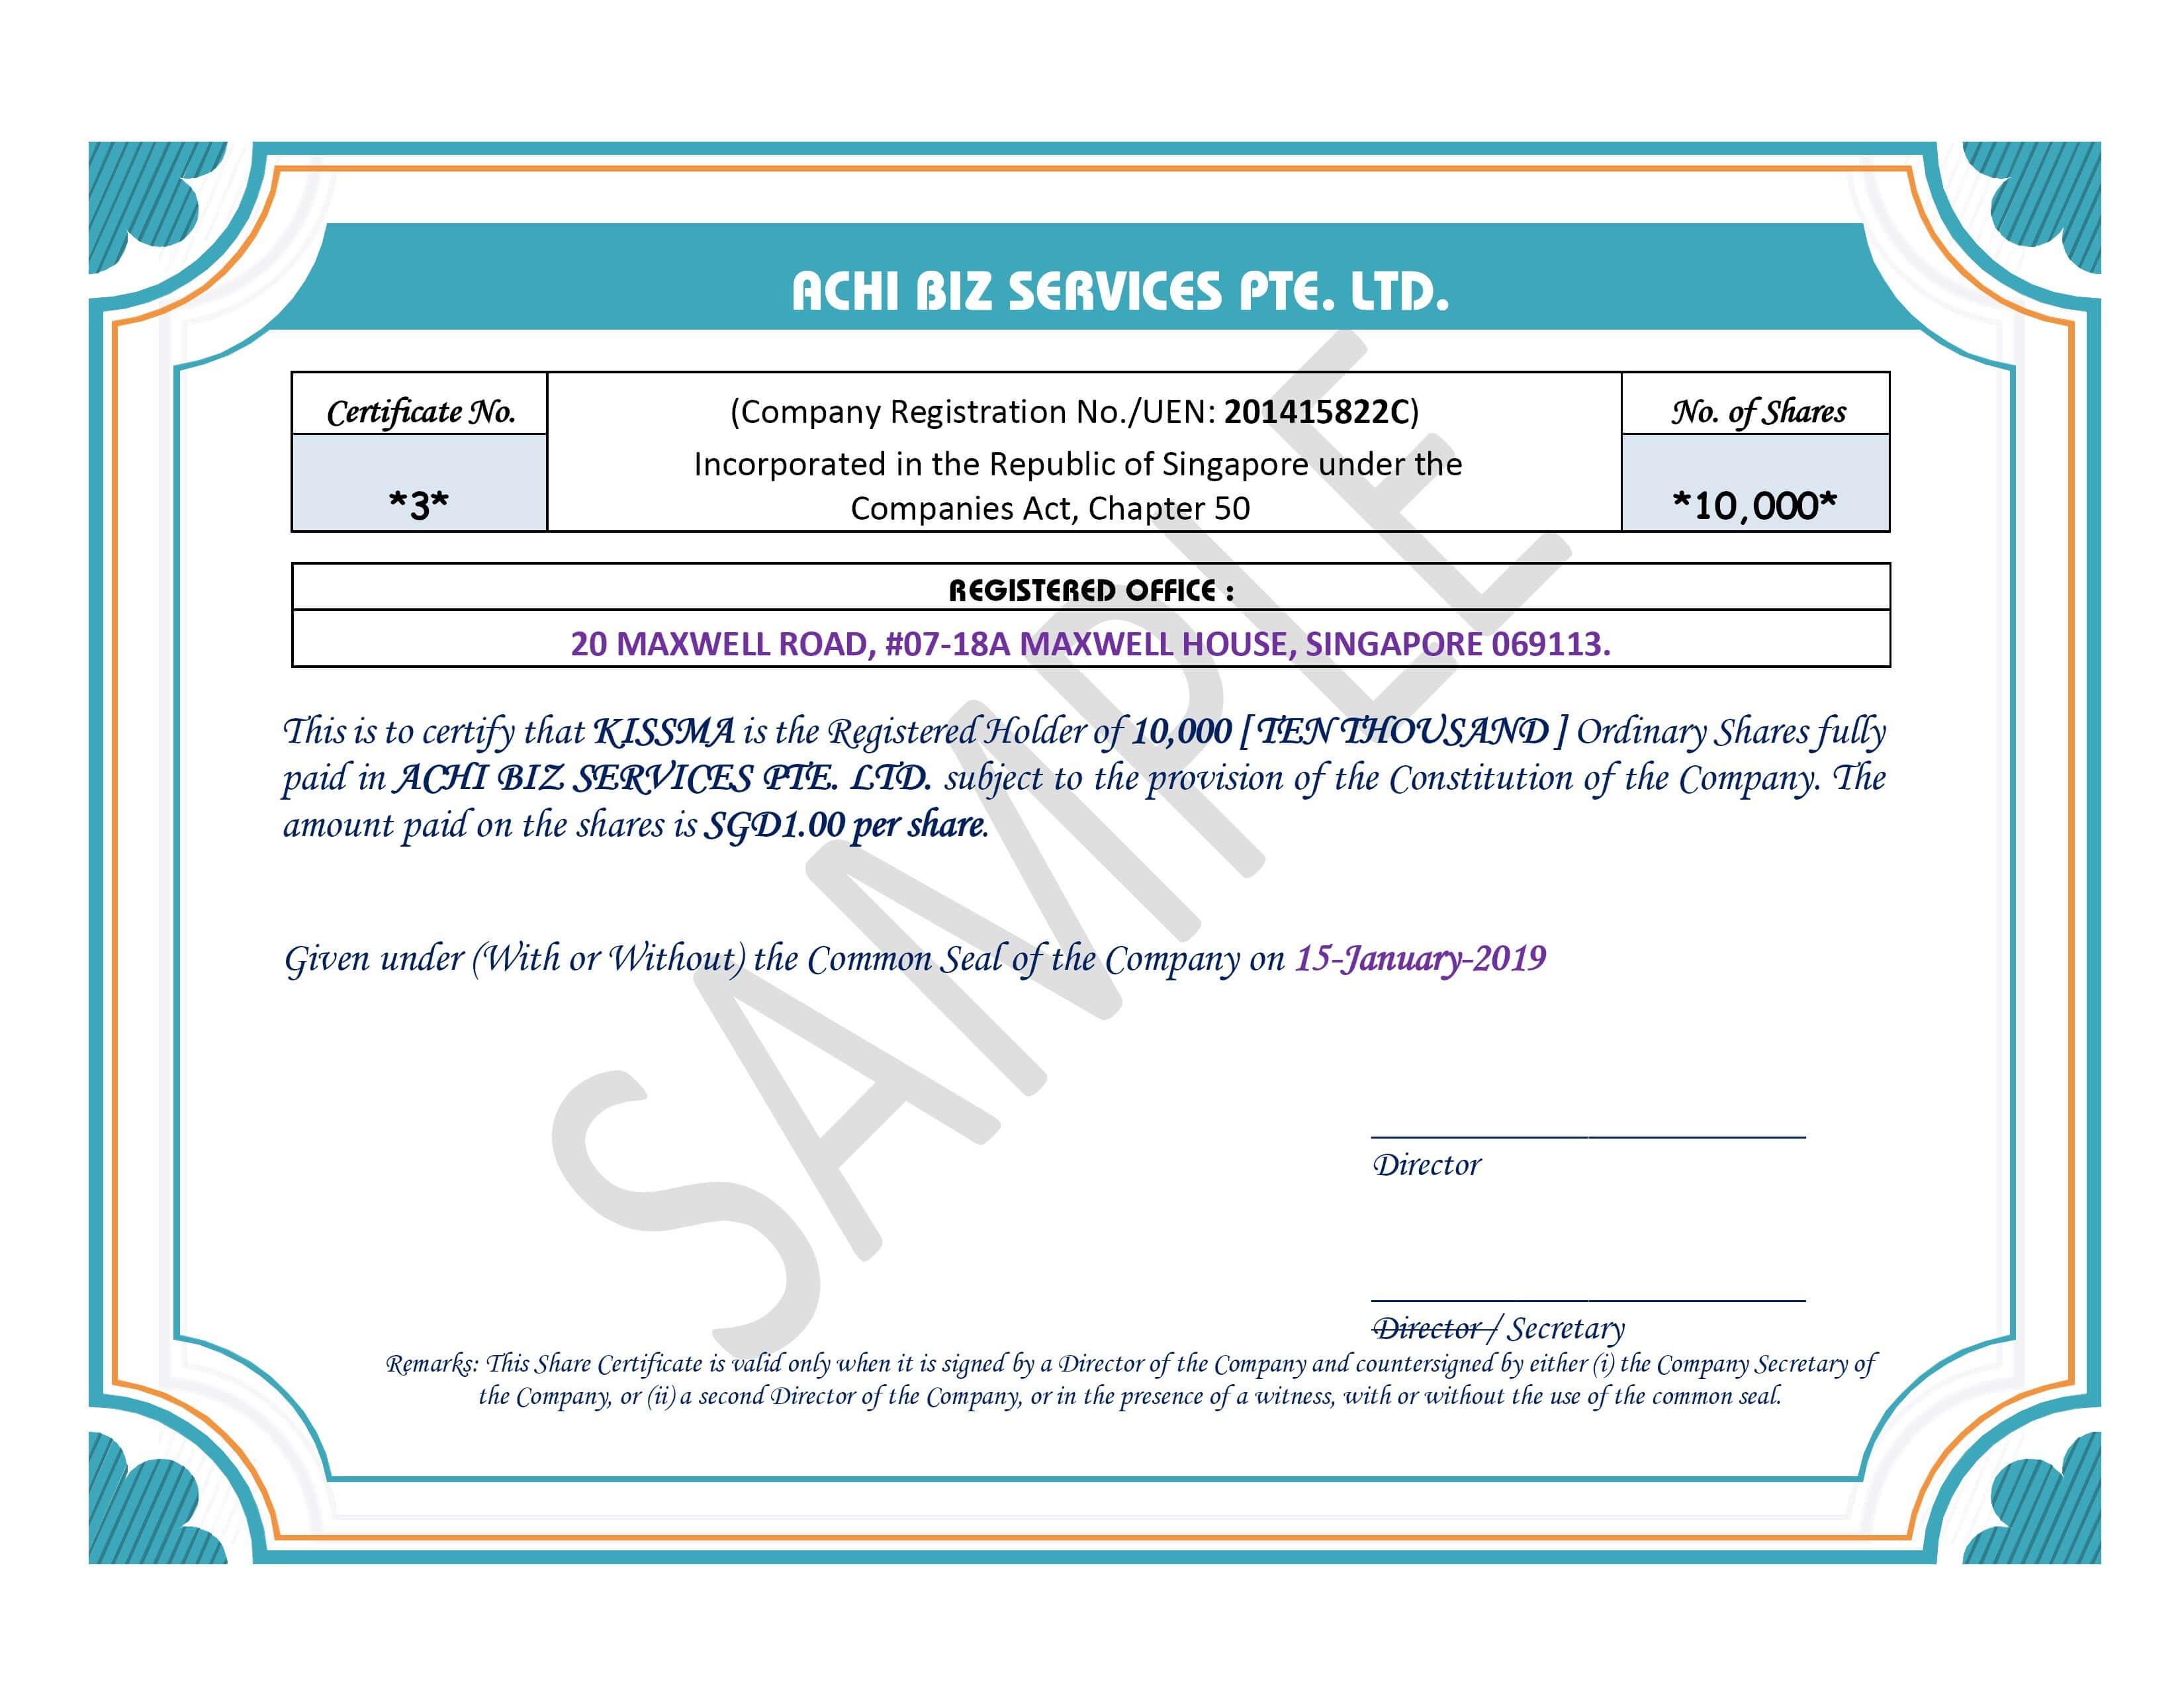 Share Certificate In Singapore ~ Achibiz inside Share Certificate Template Companies House